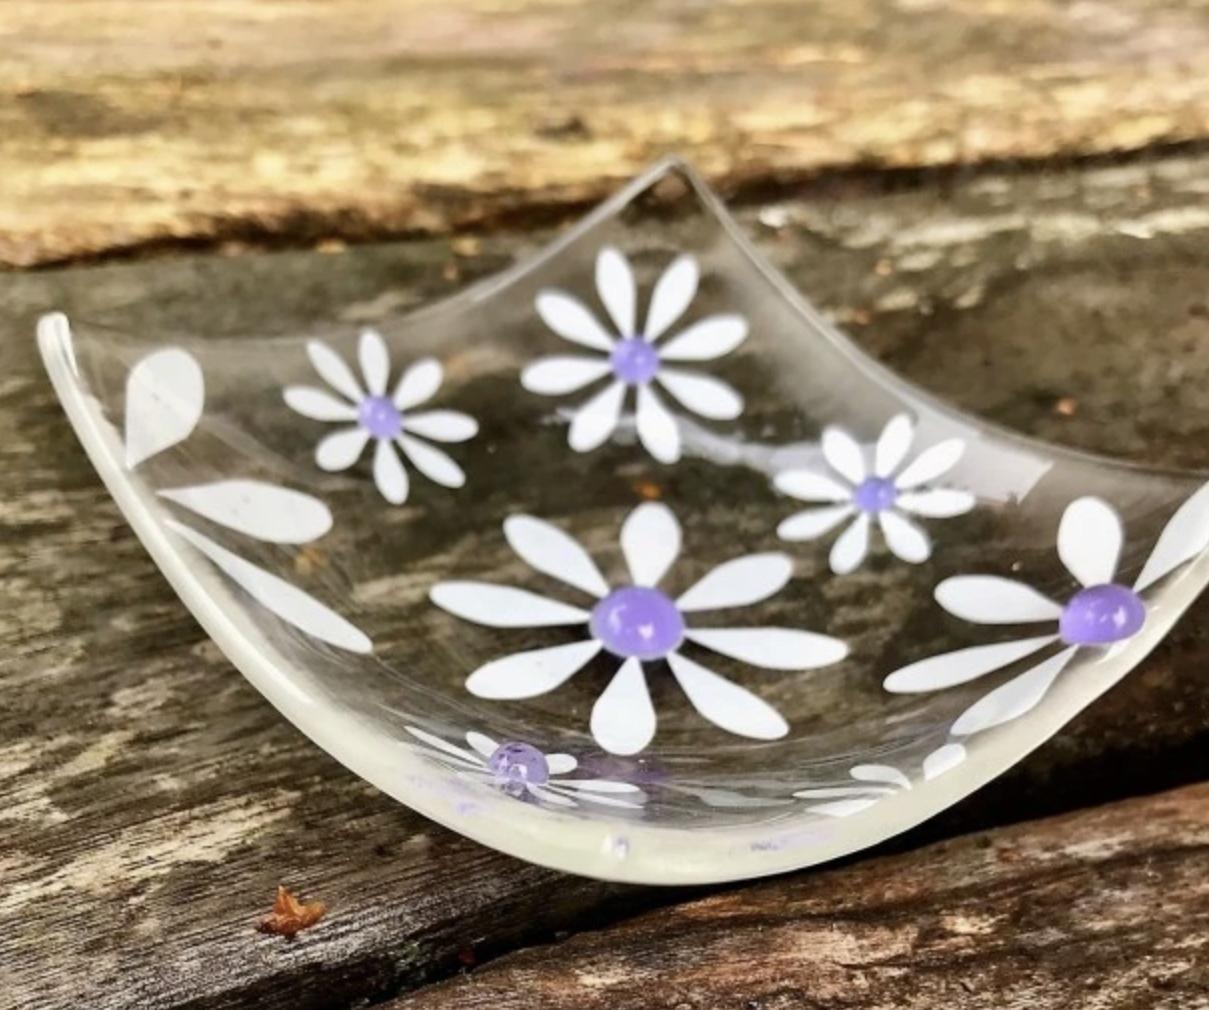 Berserks Glass simply Daisy trinket dish(small) - lavender